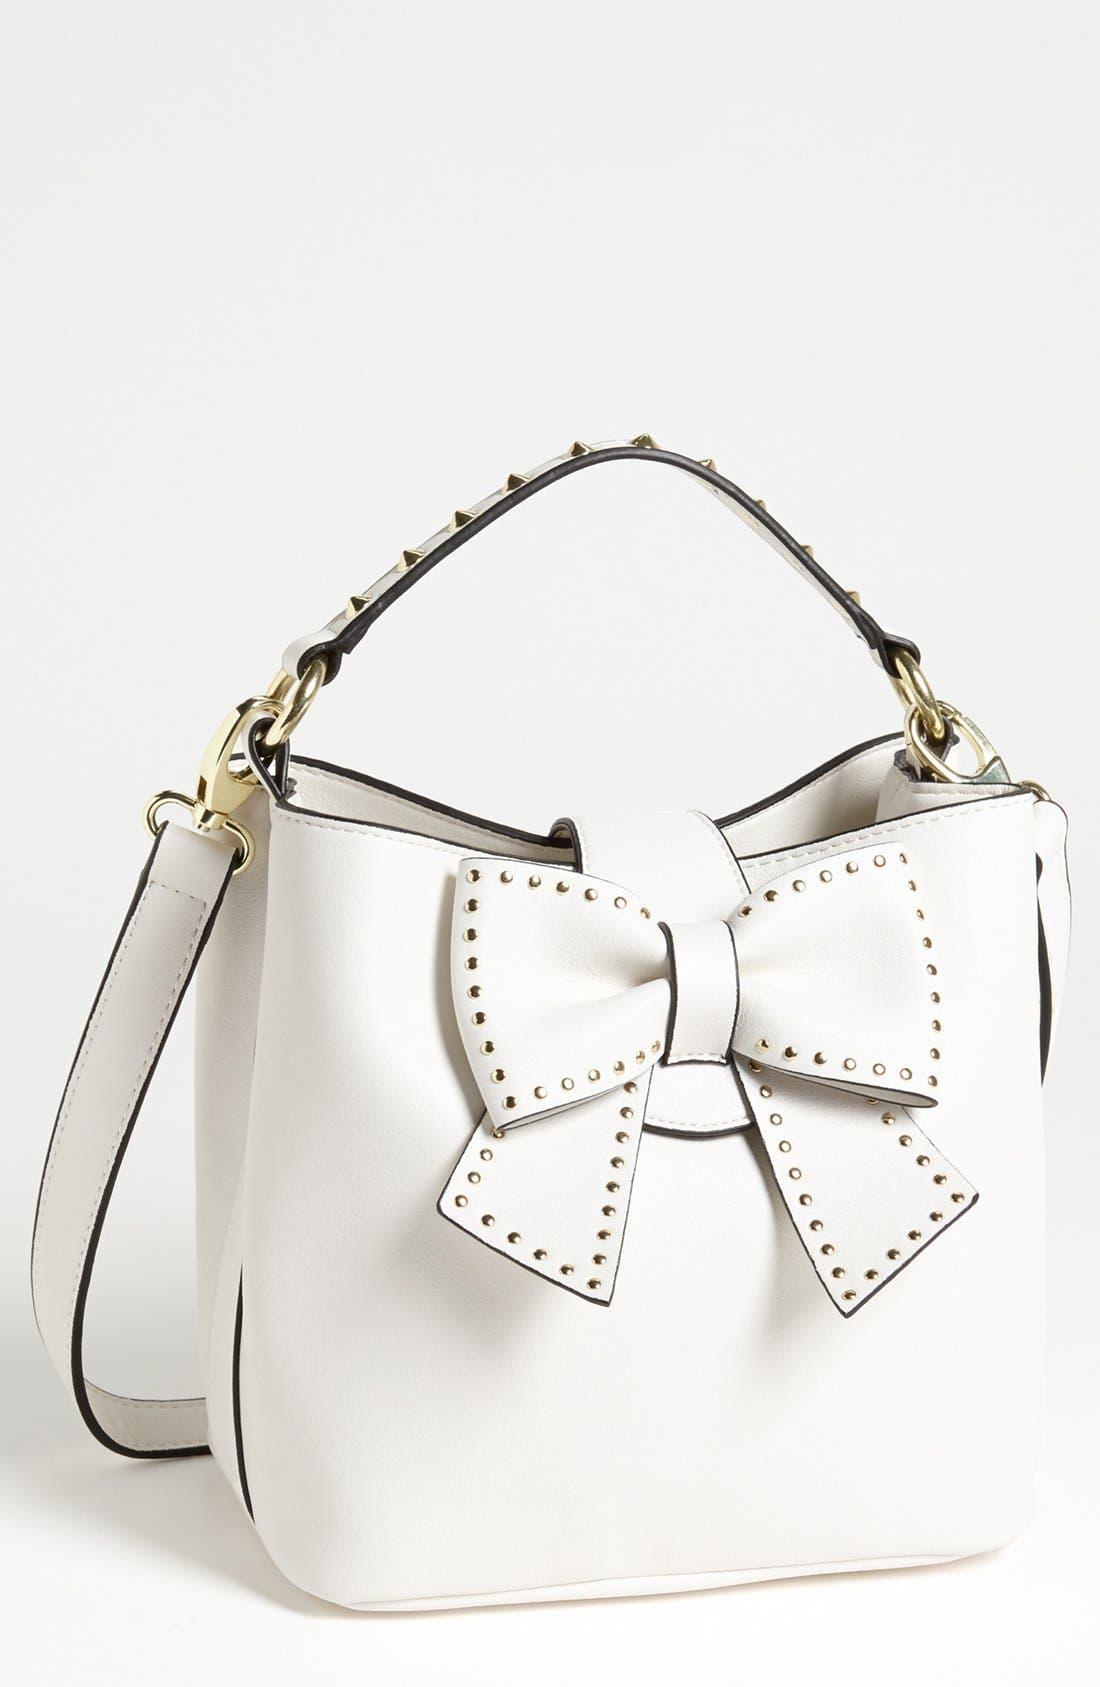 Alternate Image 1 Selected - Betsey Johnson 'Hopeless Romantic' Faux Leather Shoulder Bag